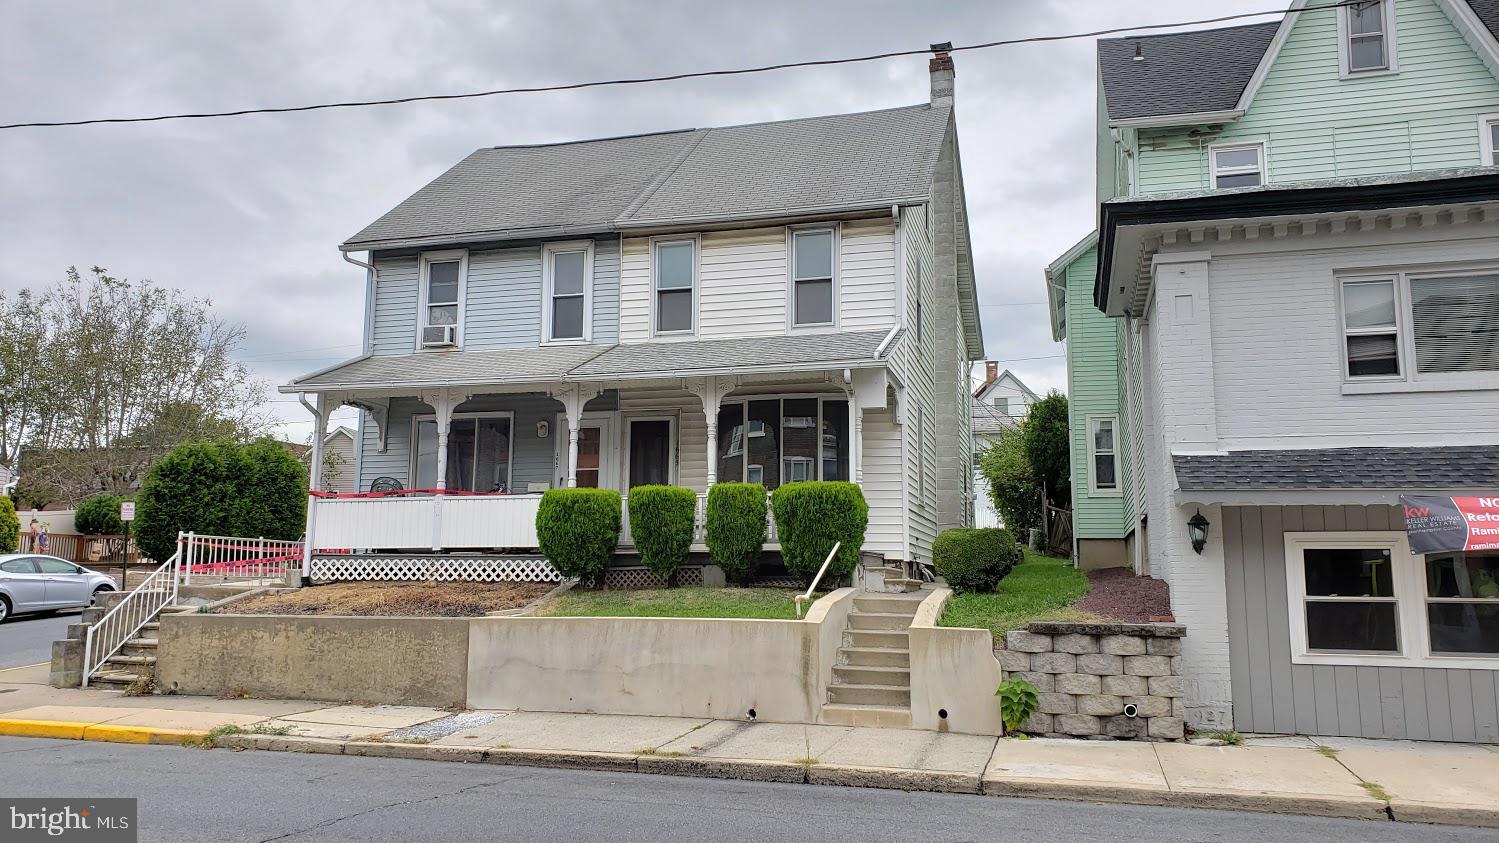 1665 MAIN STREET, NORTHAMPTON, PA 18067